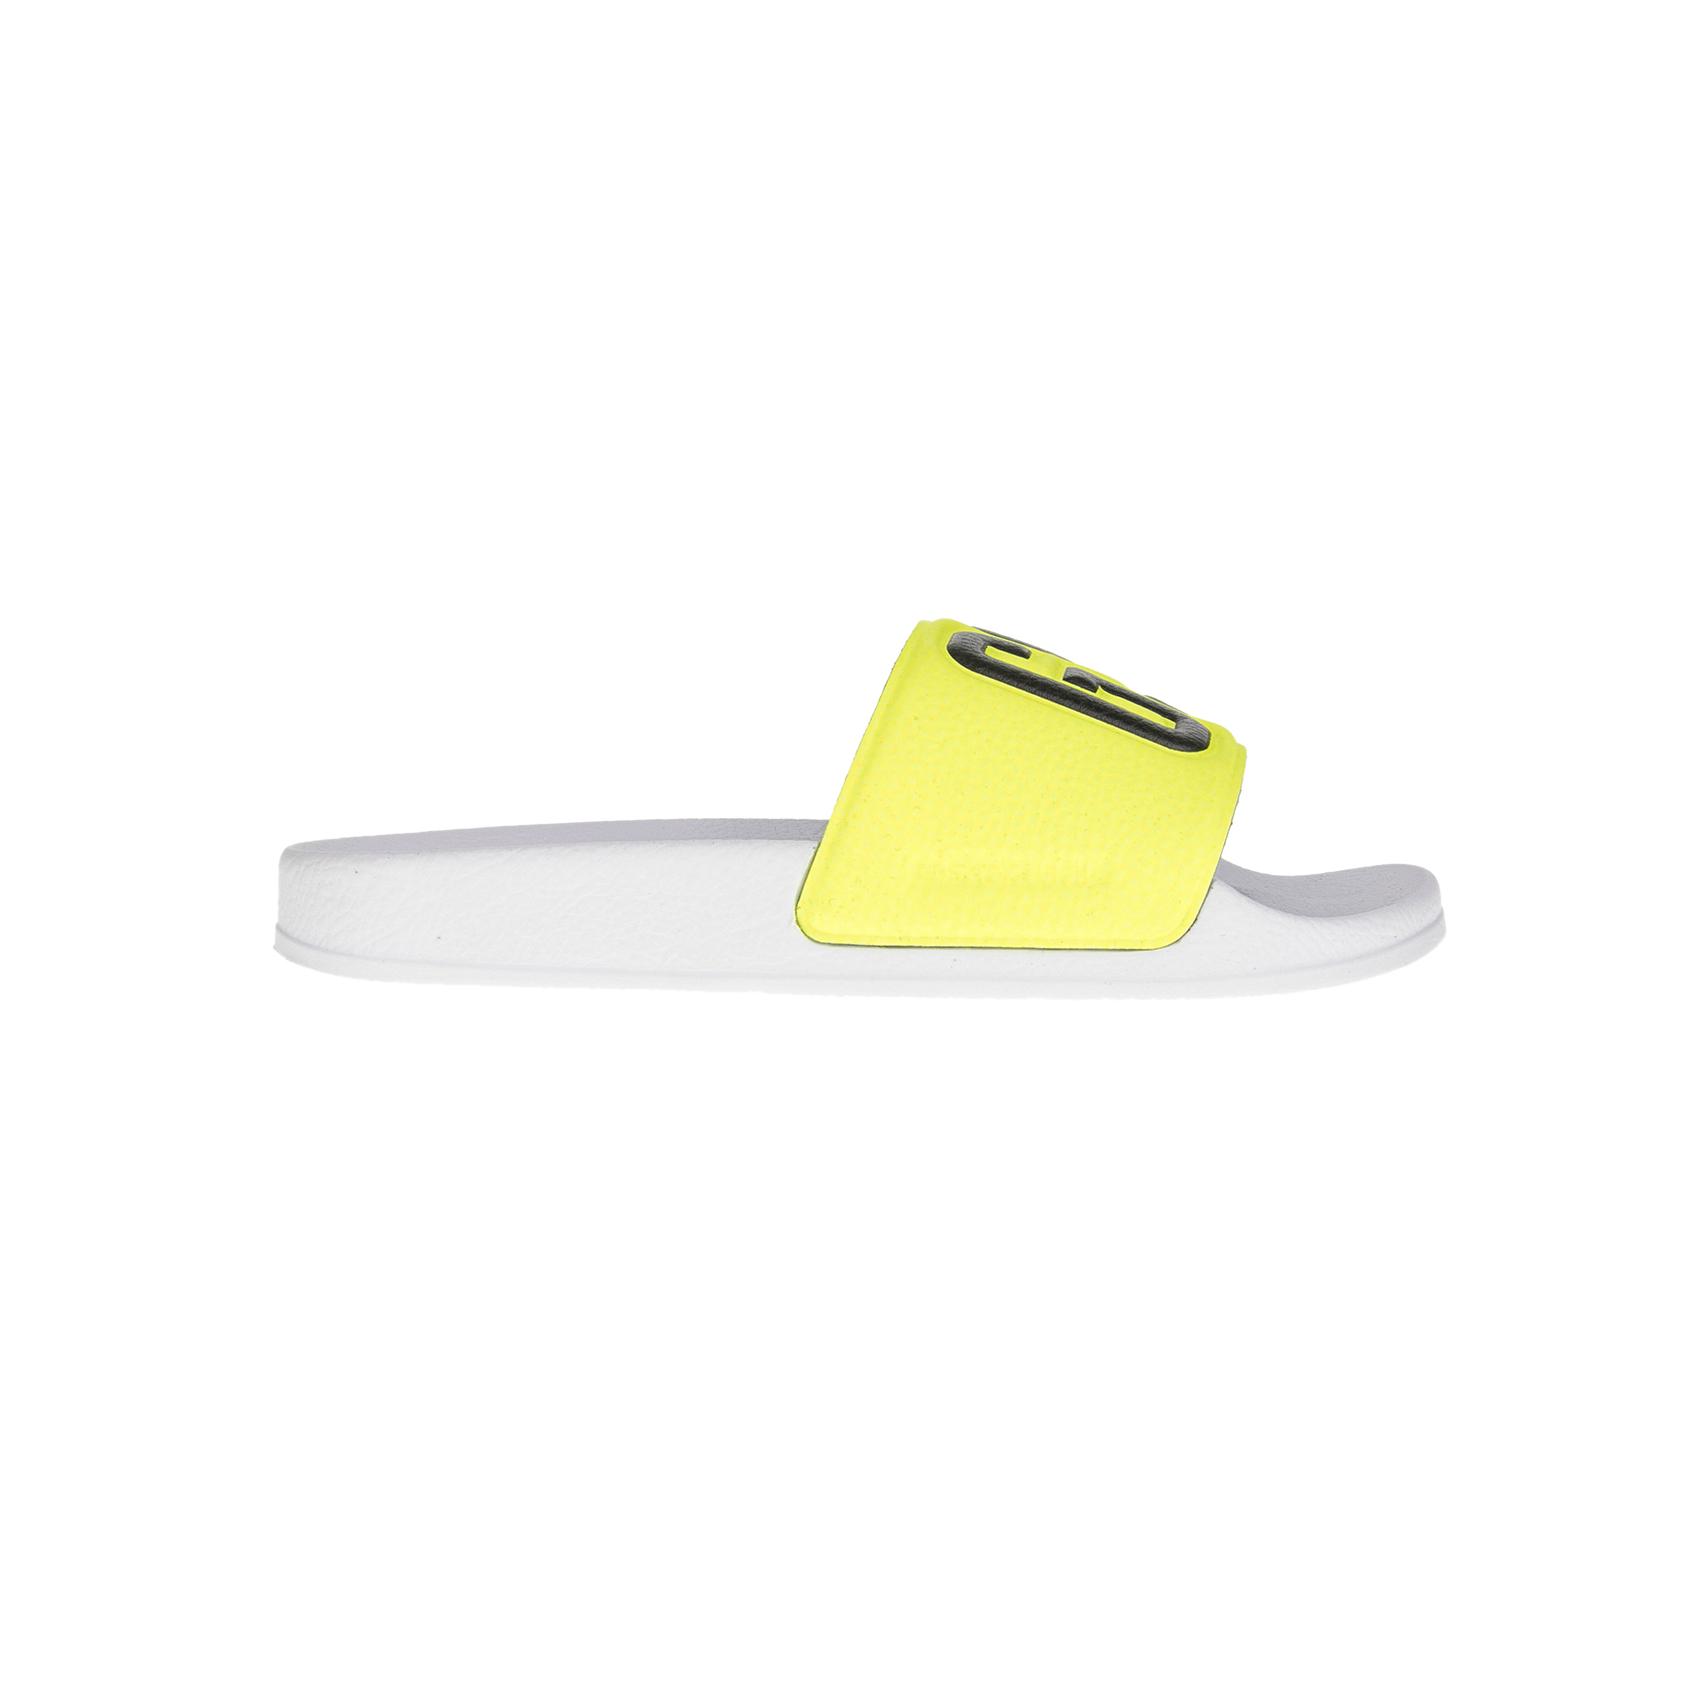 G-STAR RAW - Γυναικεία sliders G-STAR RAW λευκά-κίτρινα γυναικεία παπούτσια παντόφλες